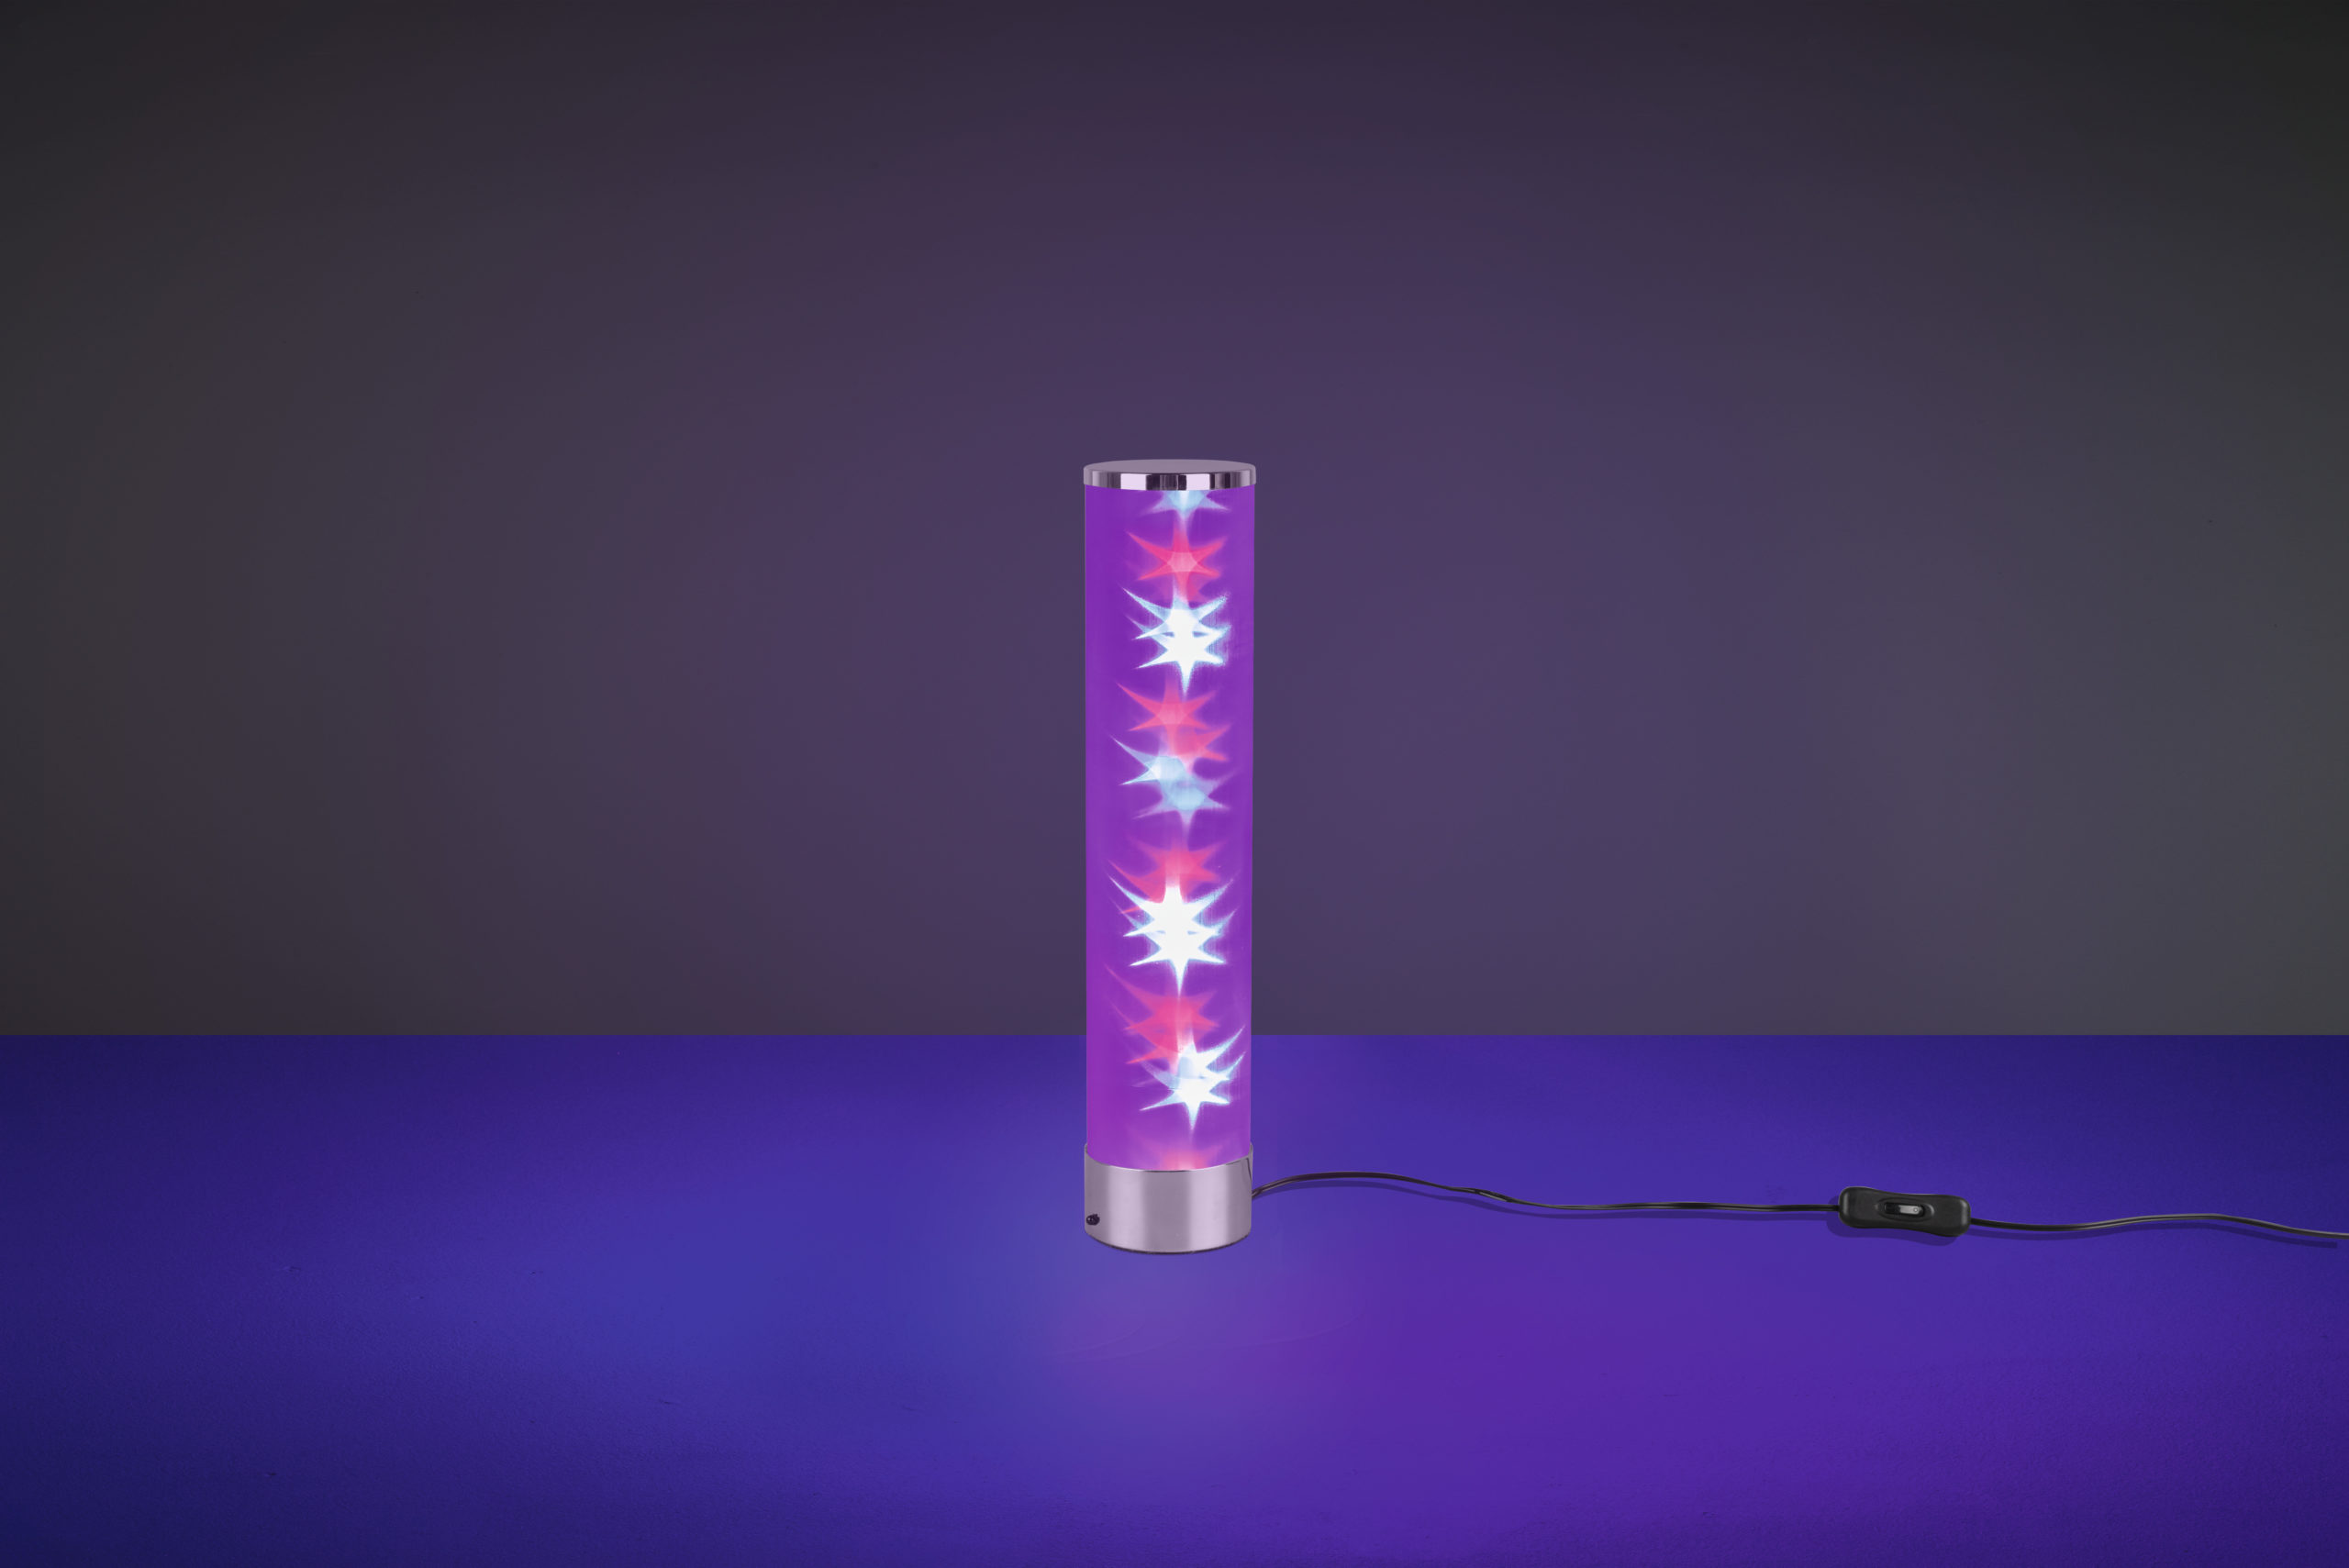 Lampe de table RGBW SMD LED, 1,5W · 1x 50lm, 3000K